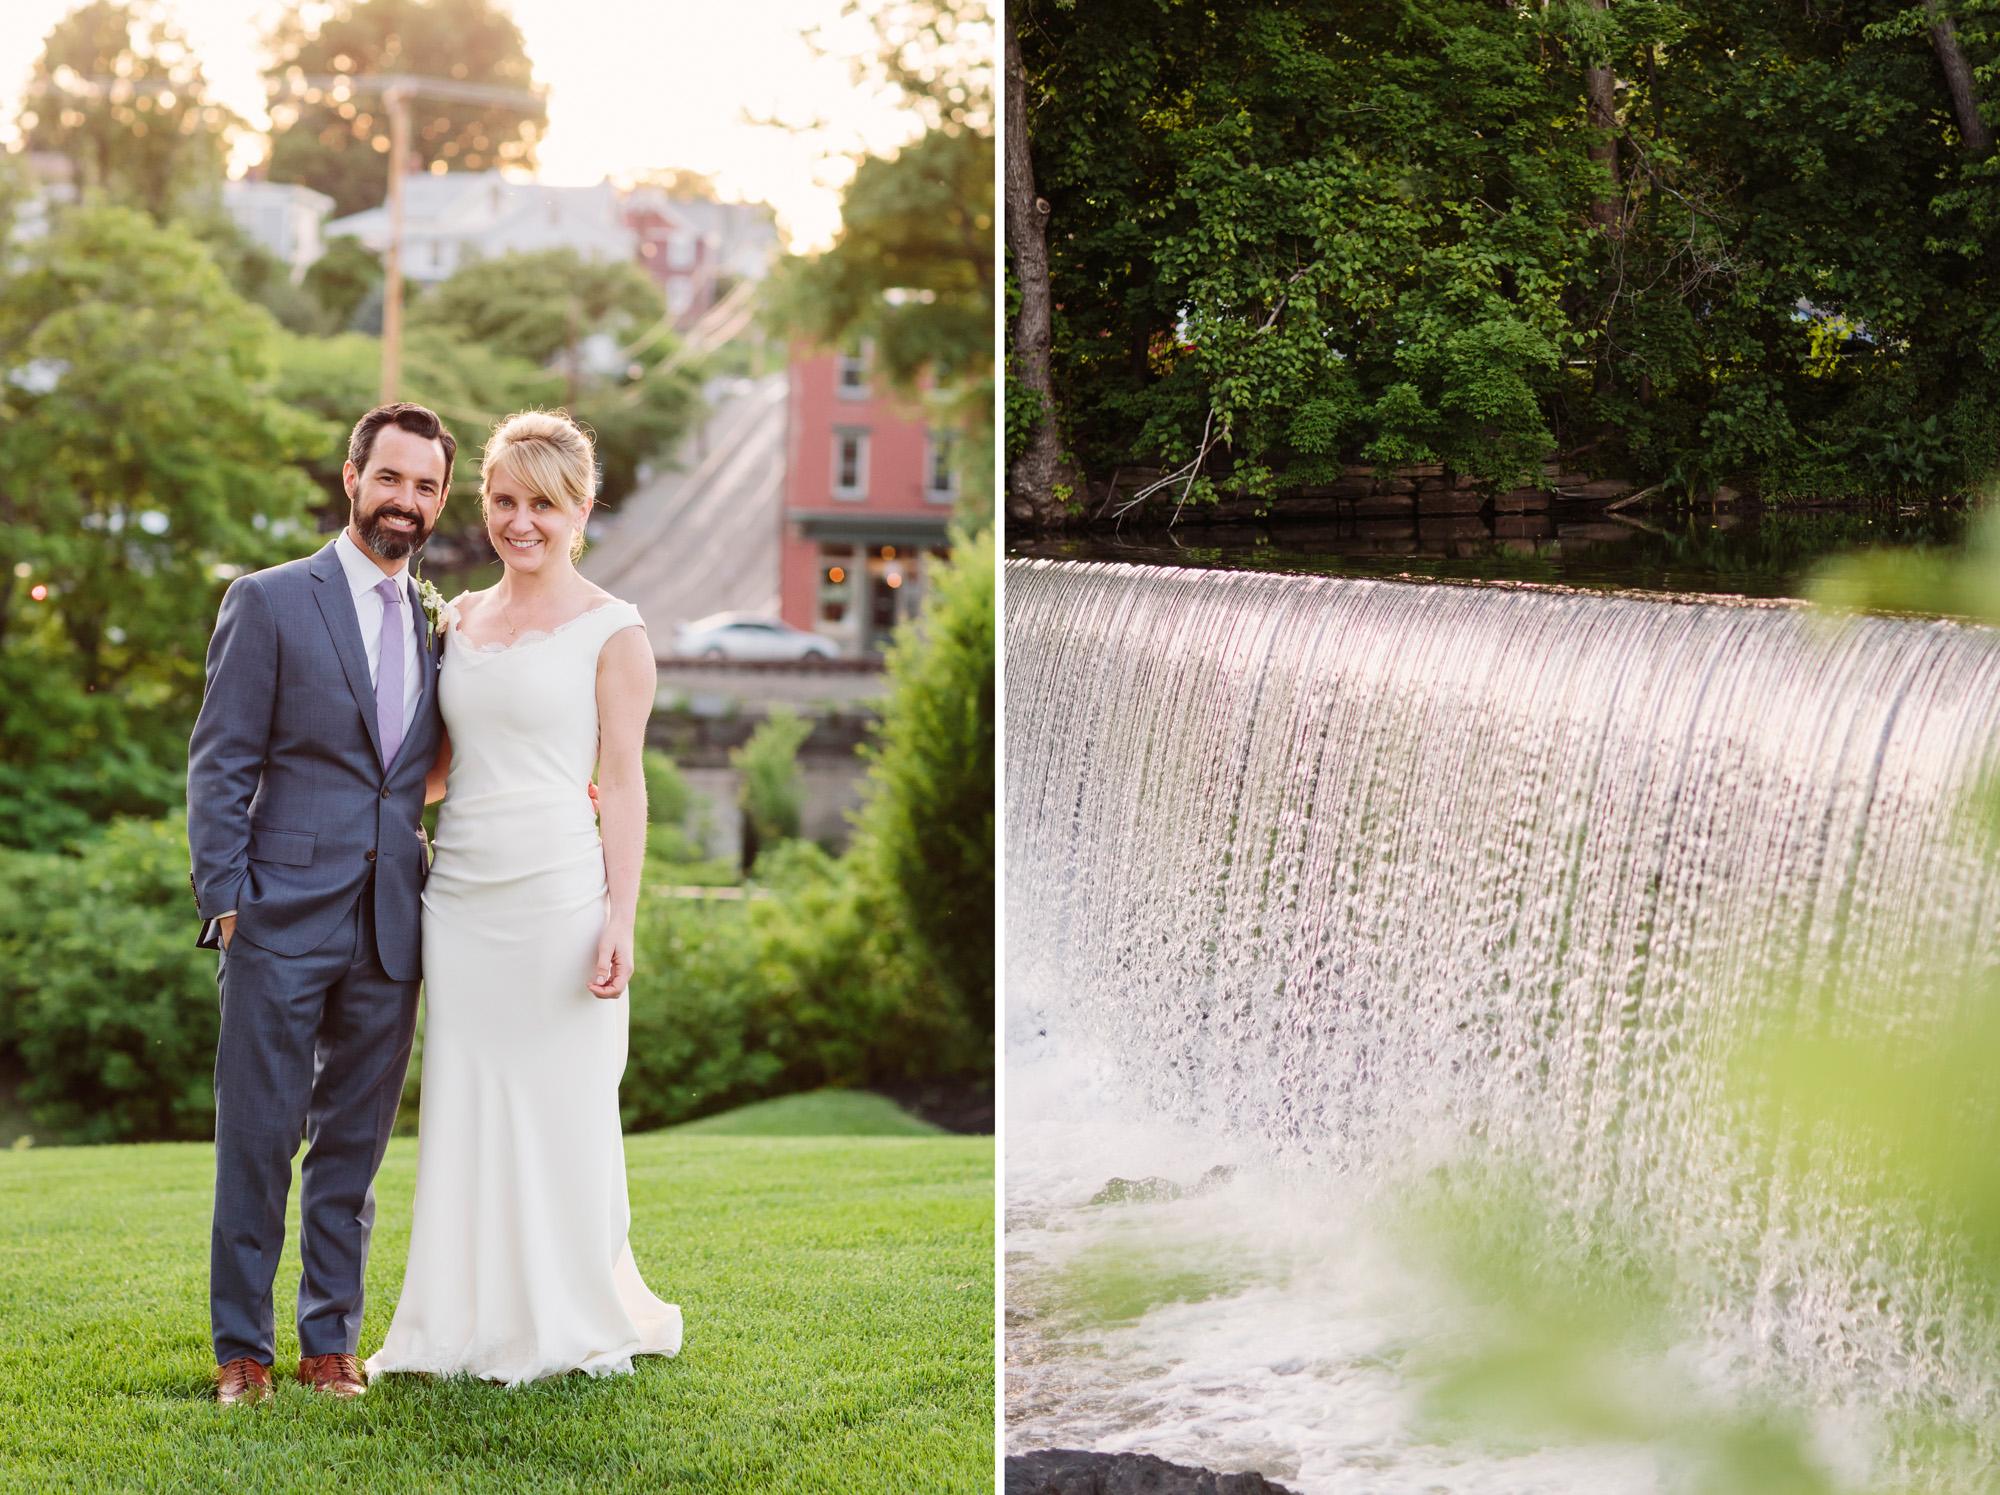 62_Rowan_Brian_The_Roundhouse_Wedding_Beacon_NY_Tanya_Salazar_Photography_D.jpg